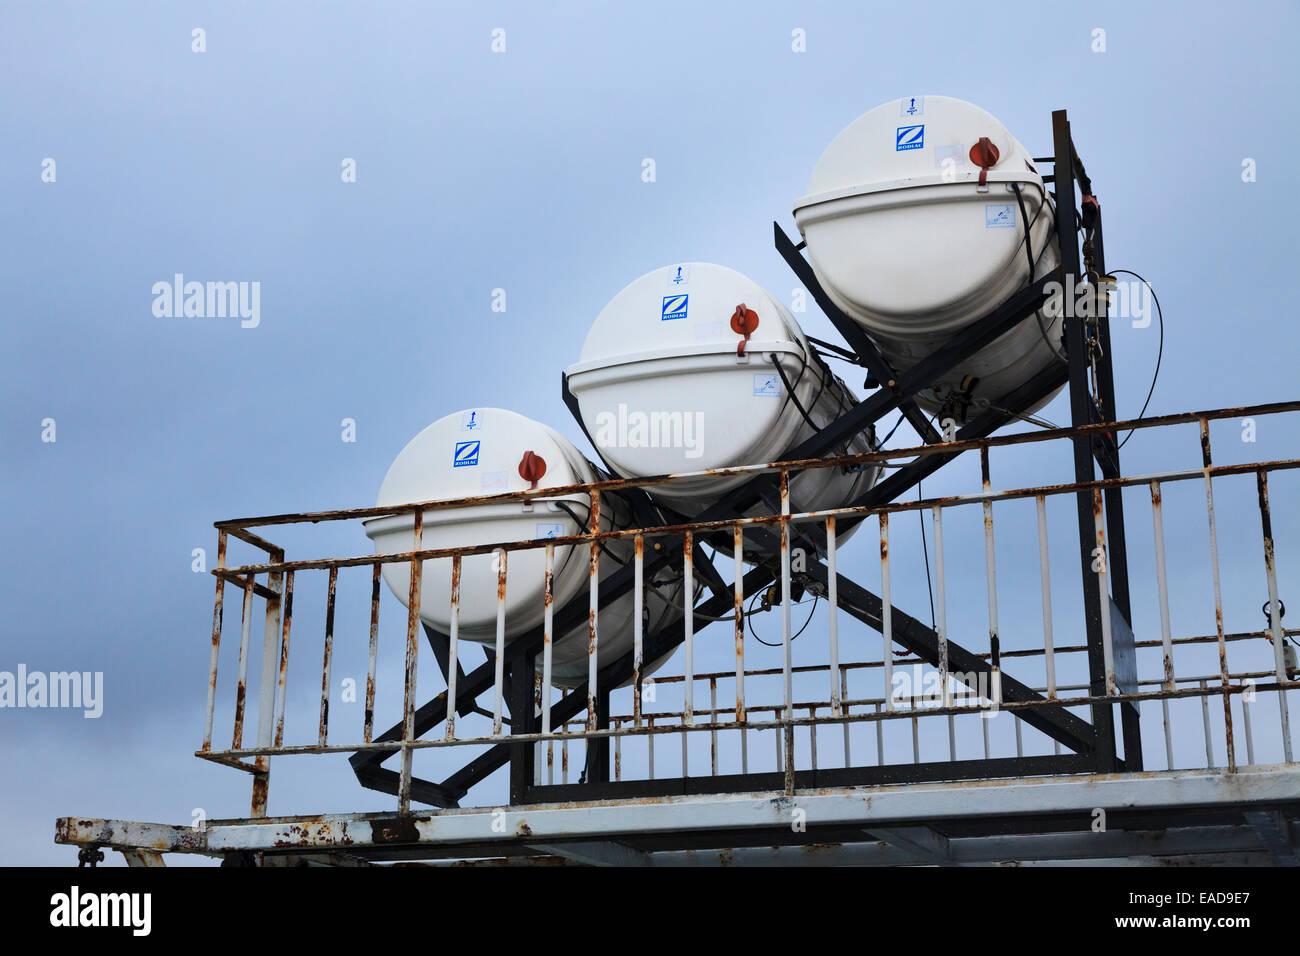 Zodiac Liferaft deployment slide on car ferry Stock Photo